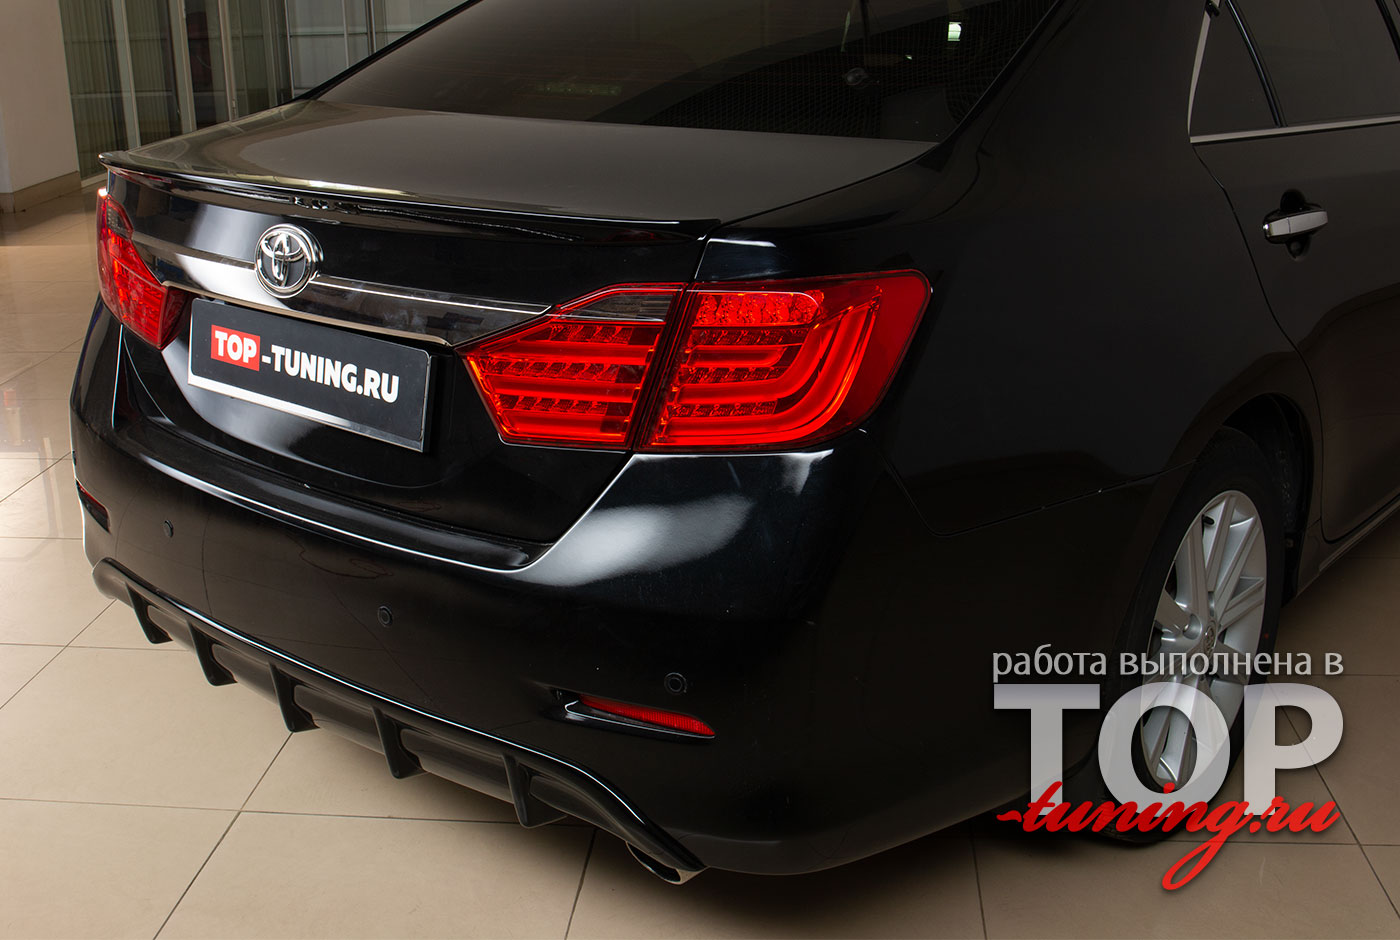 4664 Тюнинг - Диффузор на задний бампер LX Mode на Toyota Camry V50 (7)